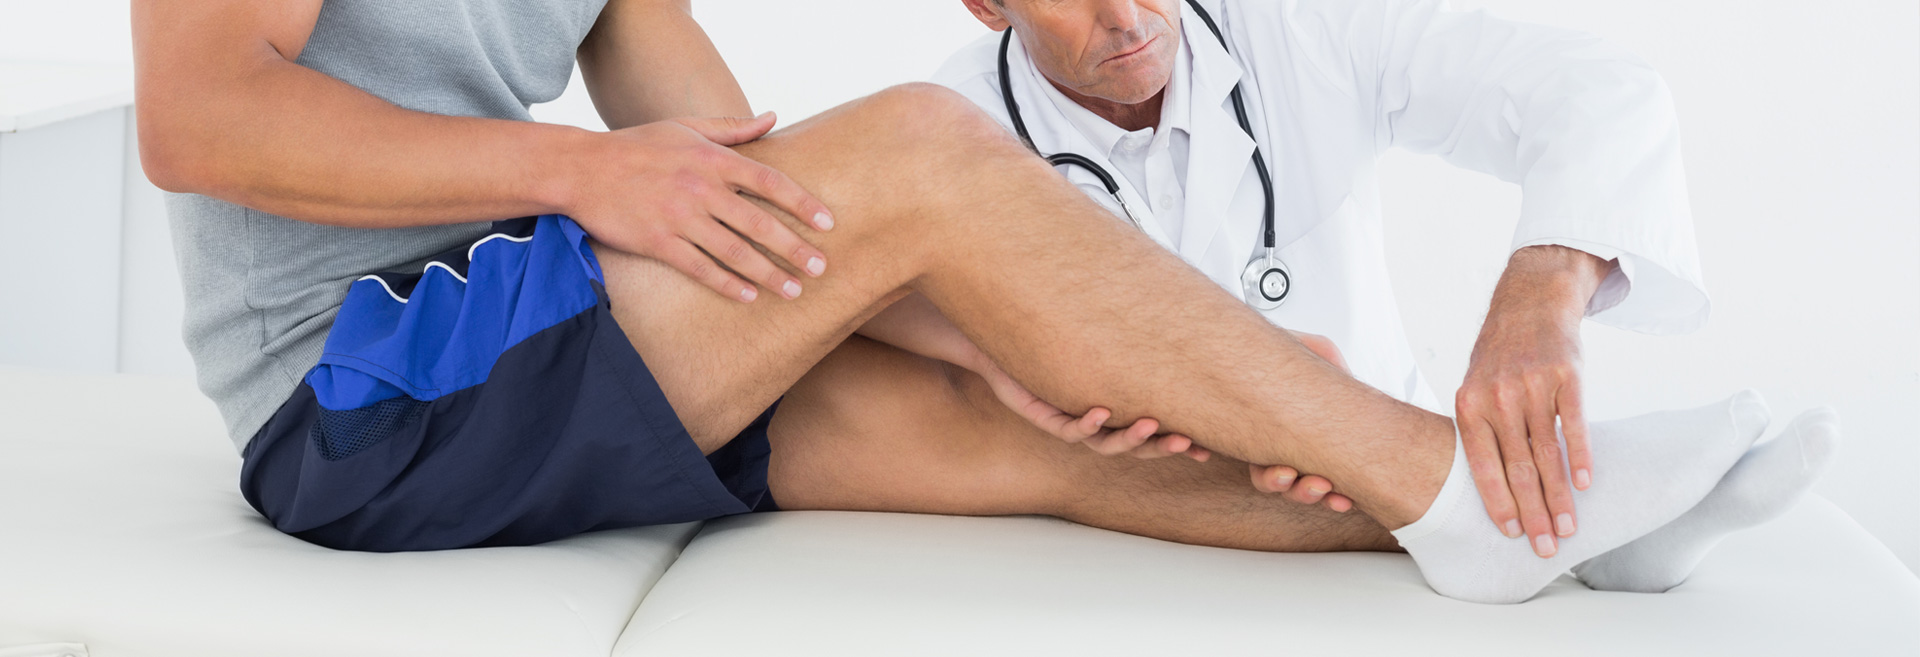 Ноют суставы ног по ночам у беременных 528